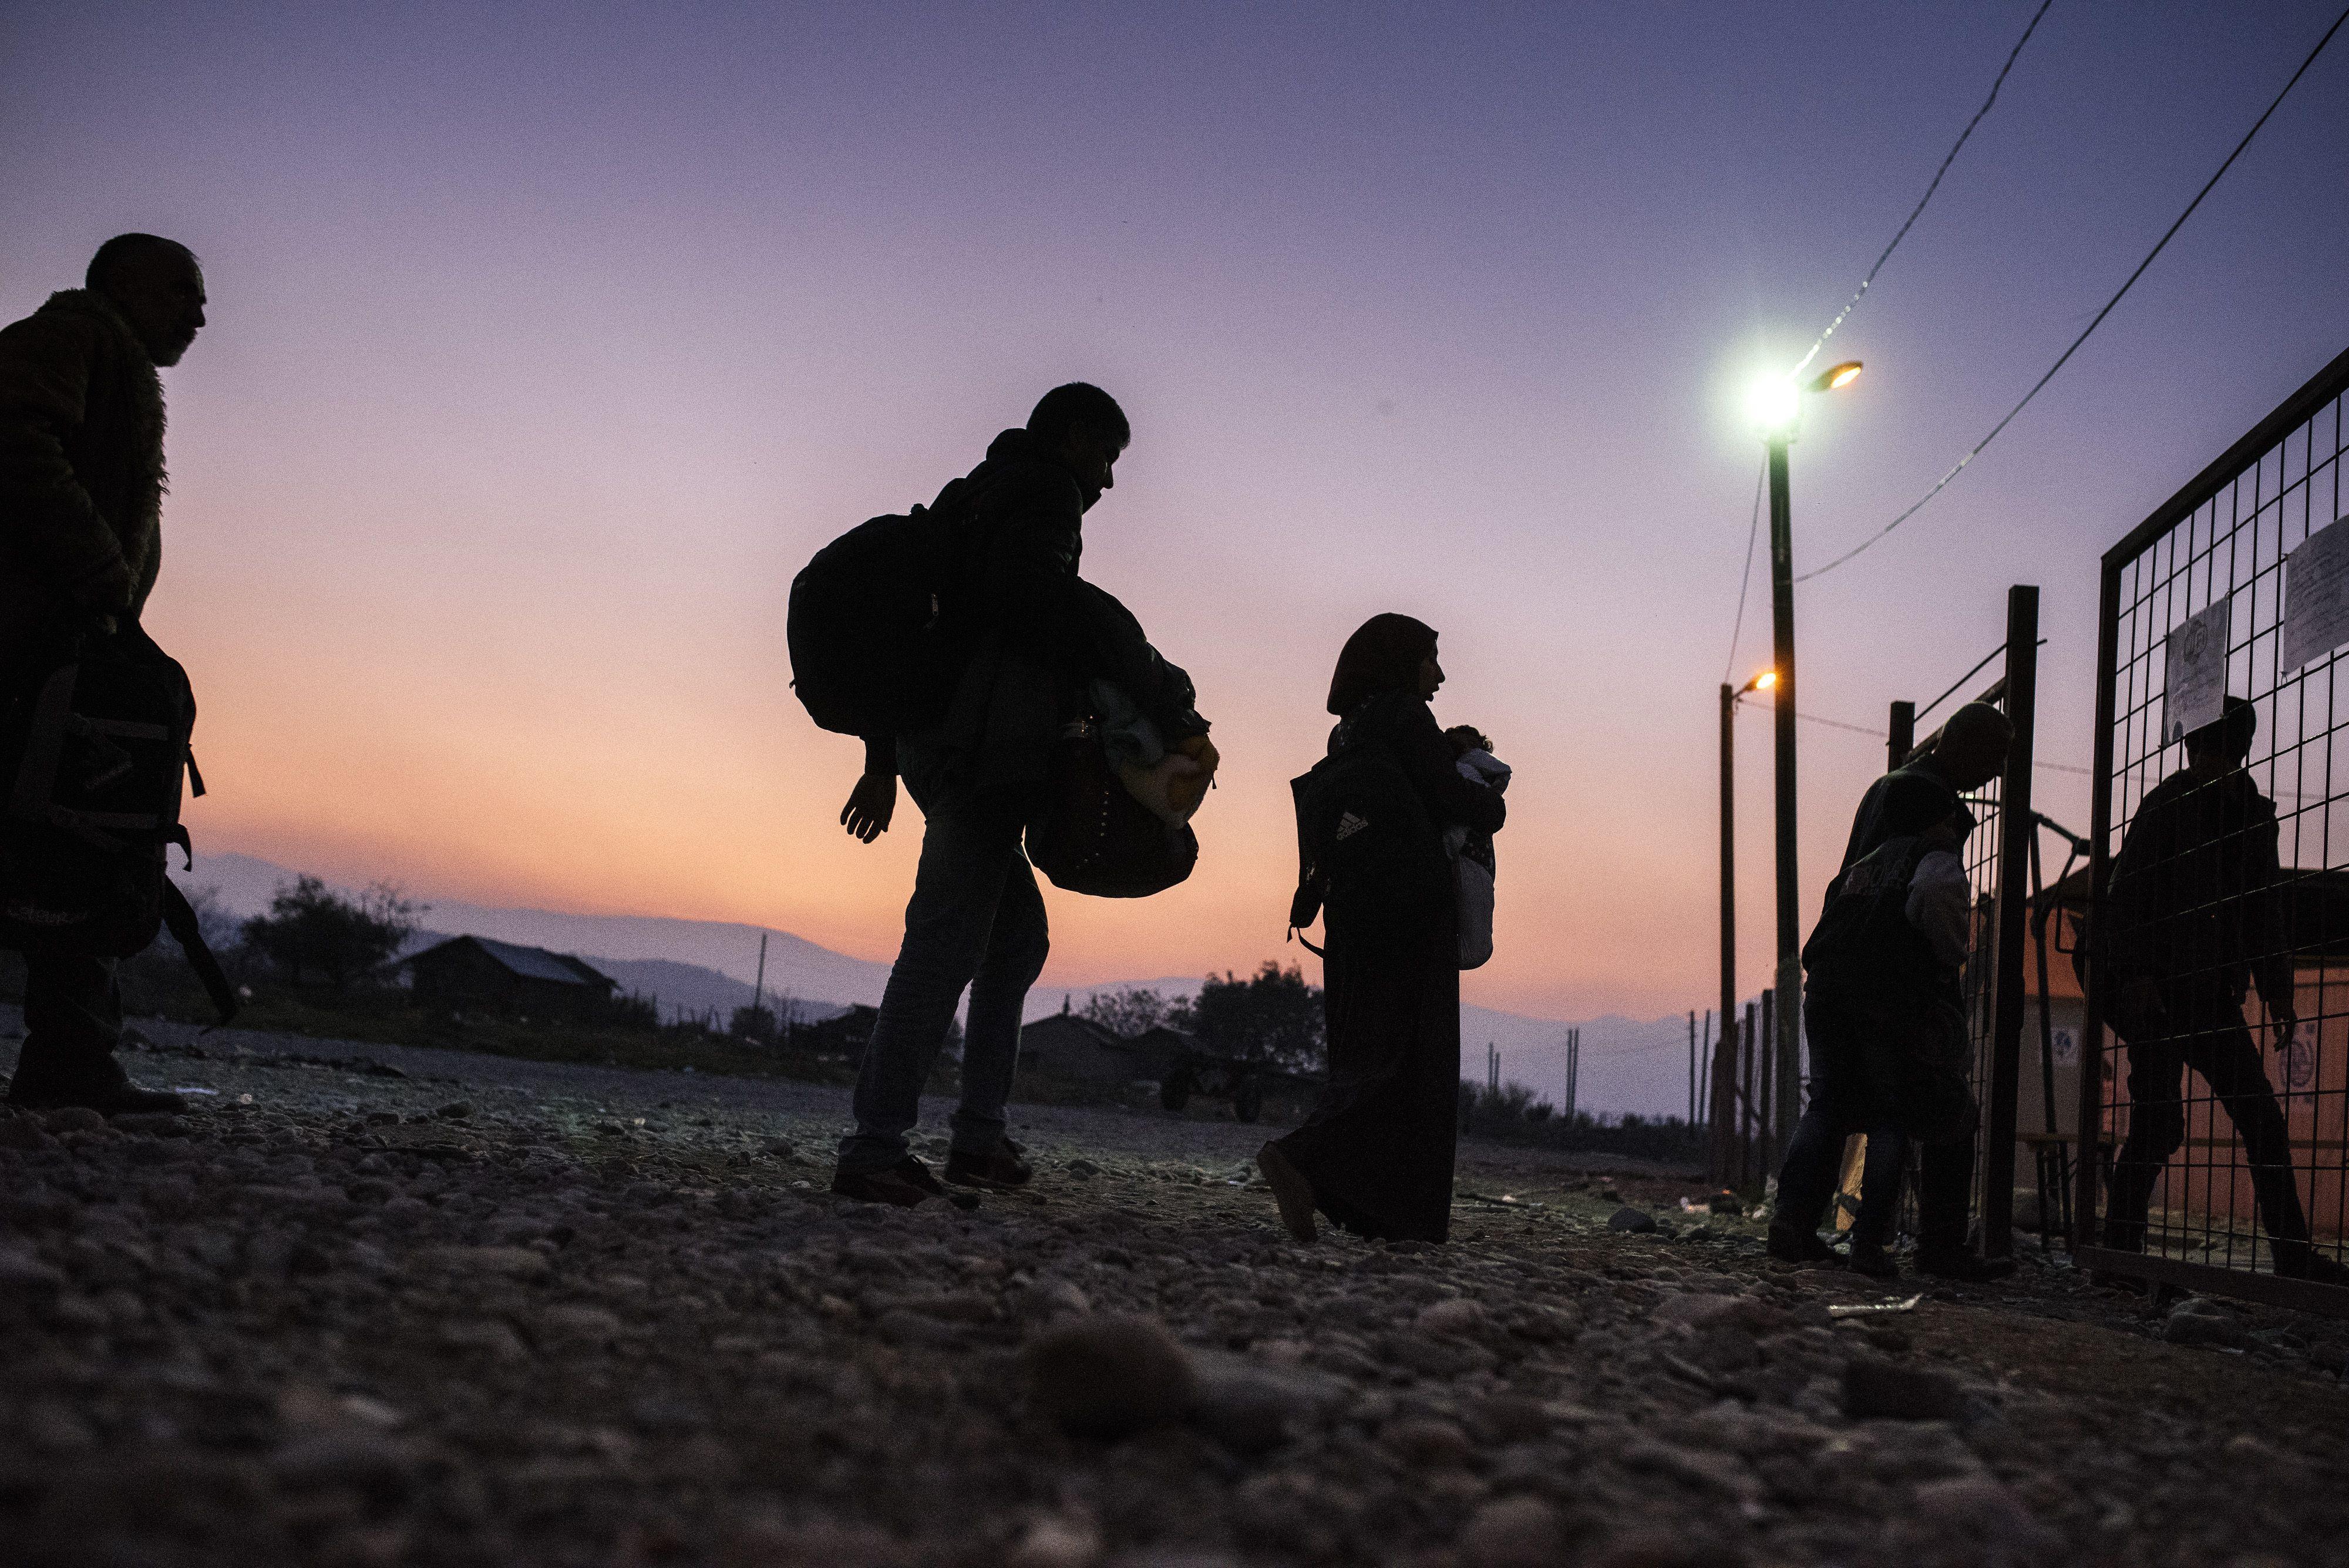 Migrants and refugees enter a registration camp after crossing the Greek-Macedonian border near Gevgelija, Macedonia on Nov. 17, 2015.